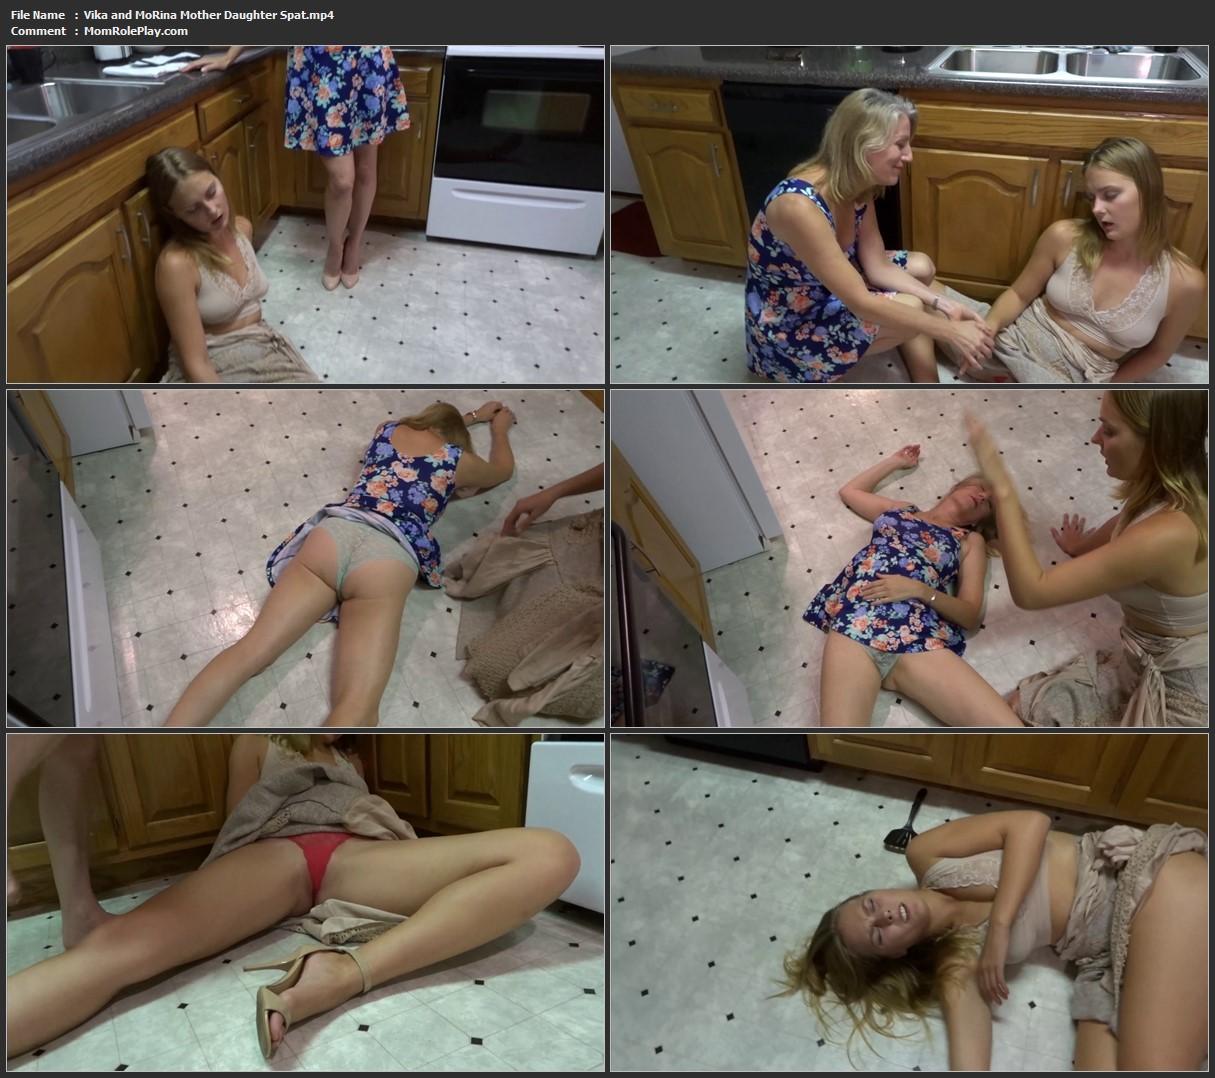 Vika and MoRina Mother Daughter Spat